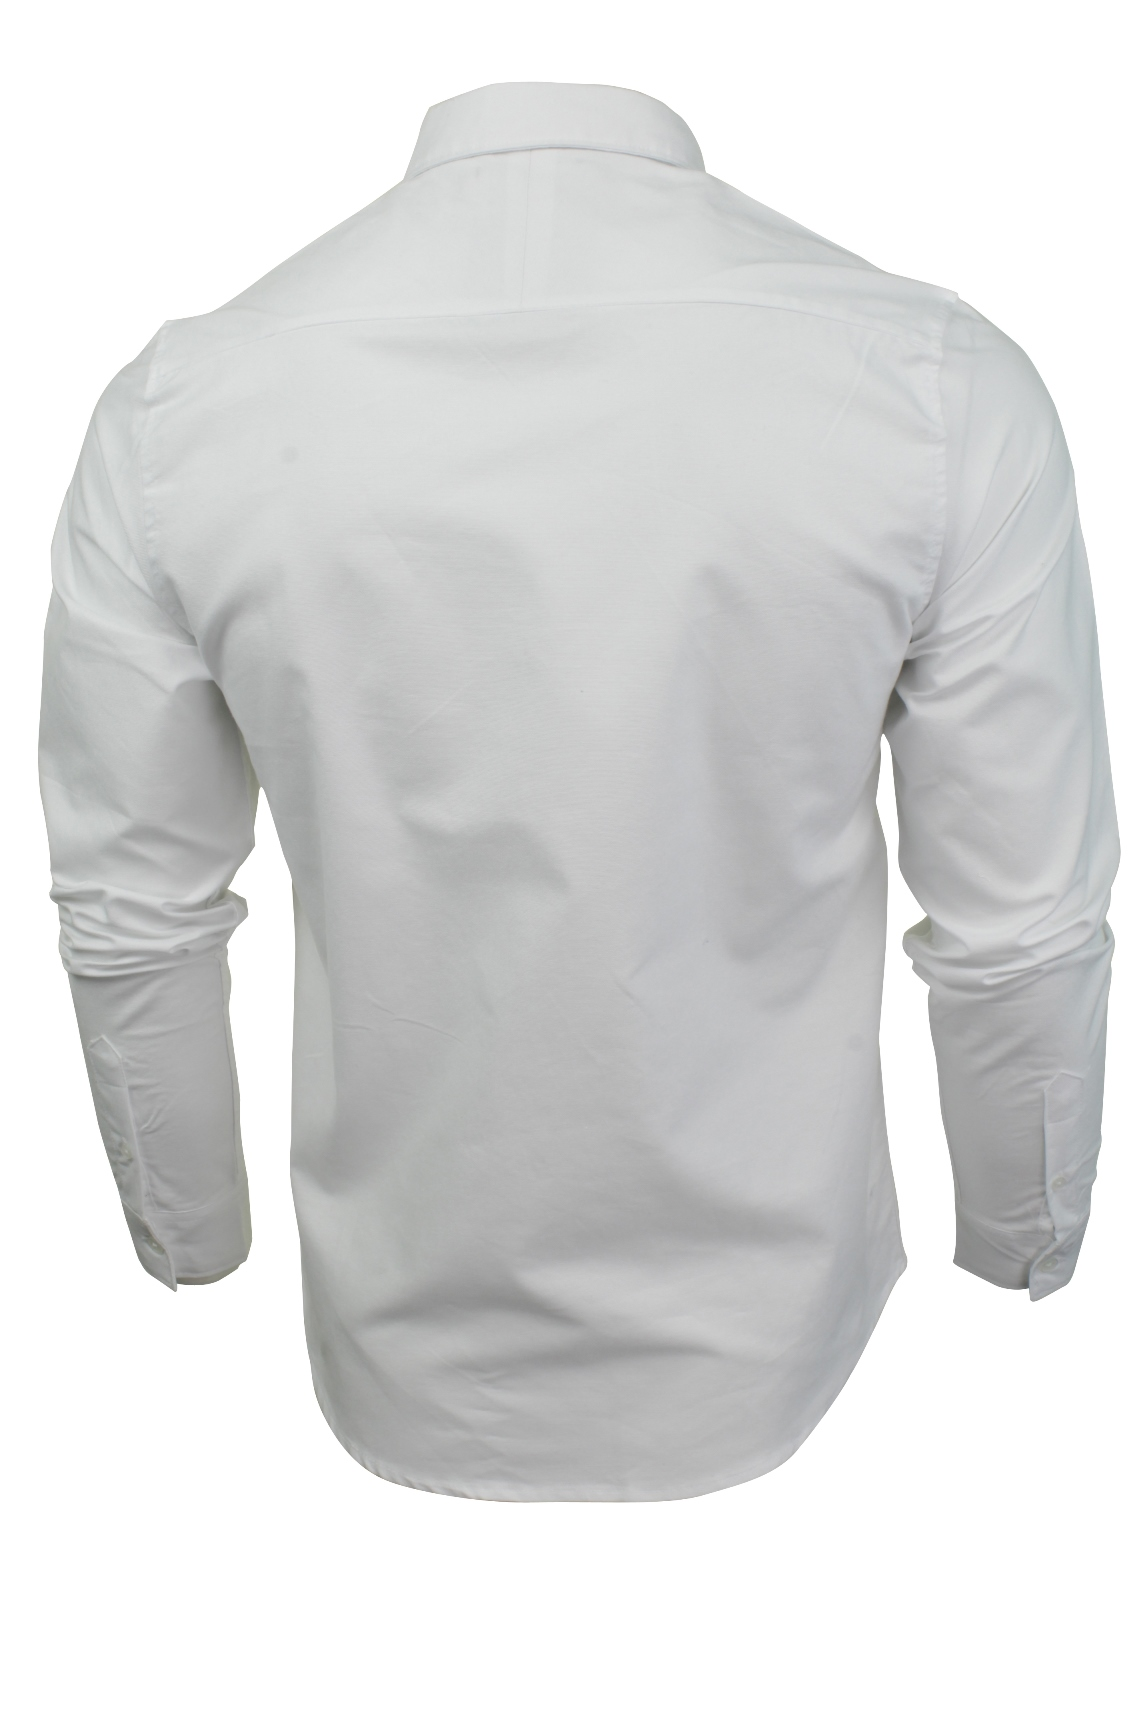 Camicia-da-Uomo-da-Brave-Soul-034-POMPEI-034-A-Maniche-Lunghe-Oxford miniatura 8